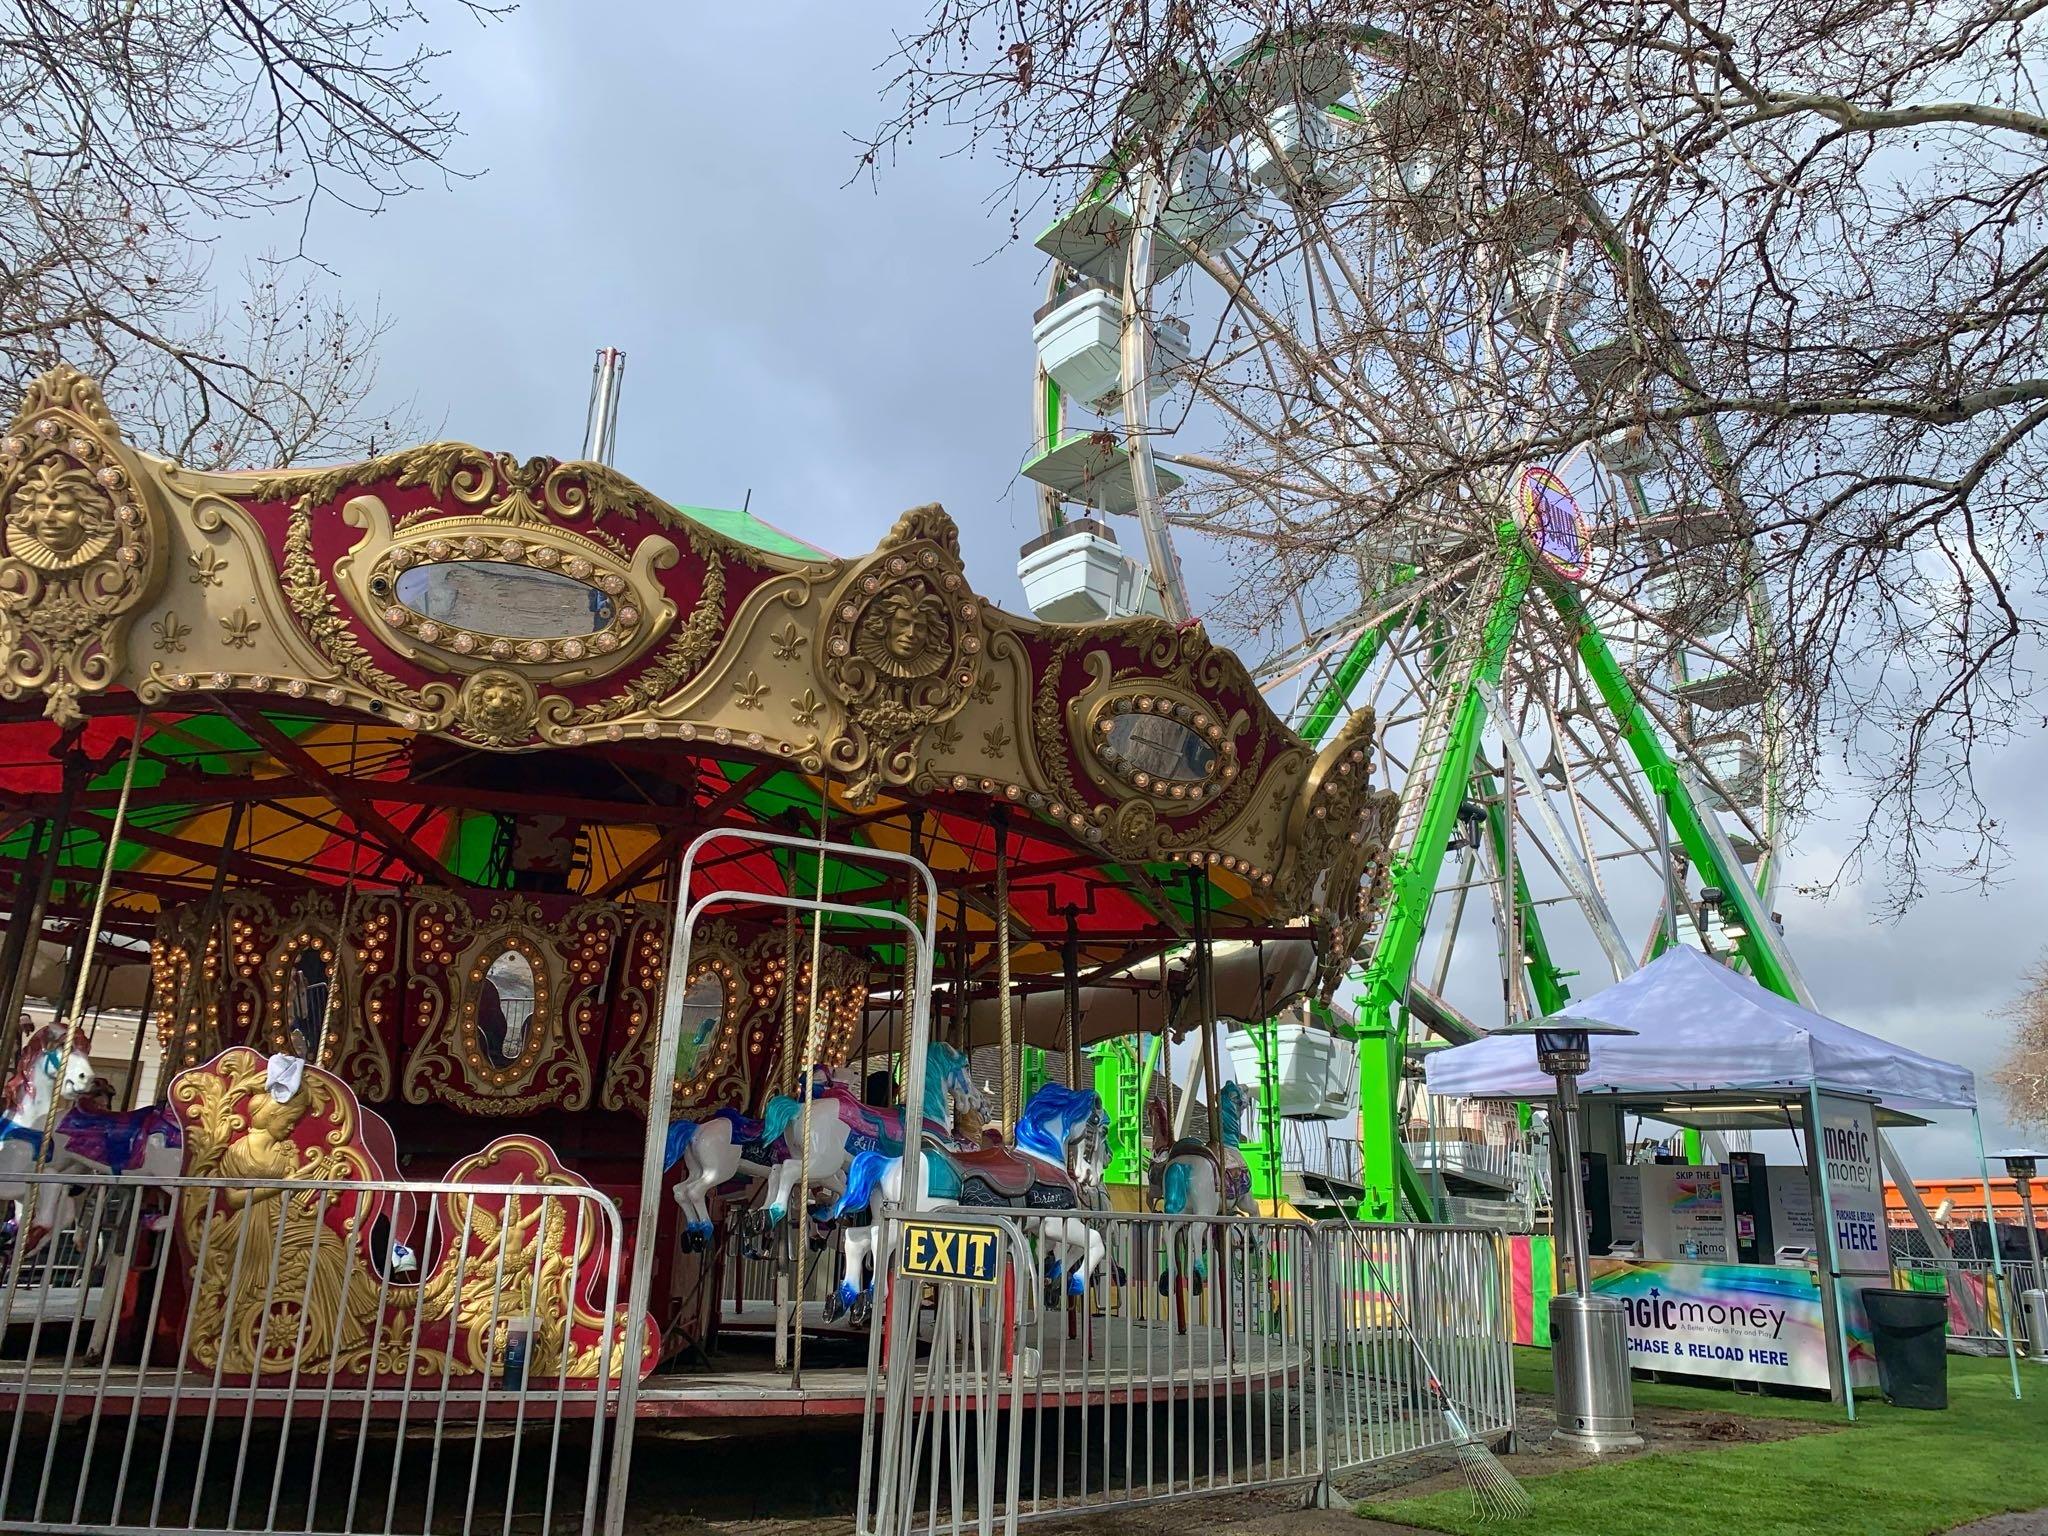 An Enchanting Front Street Carousel Installed at the Old Sacramento Waterfront via @sacramentopress